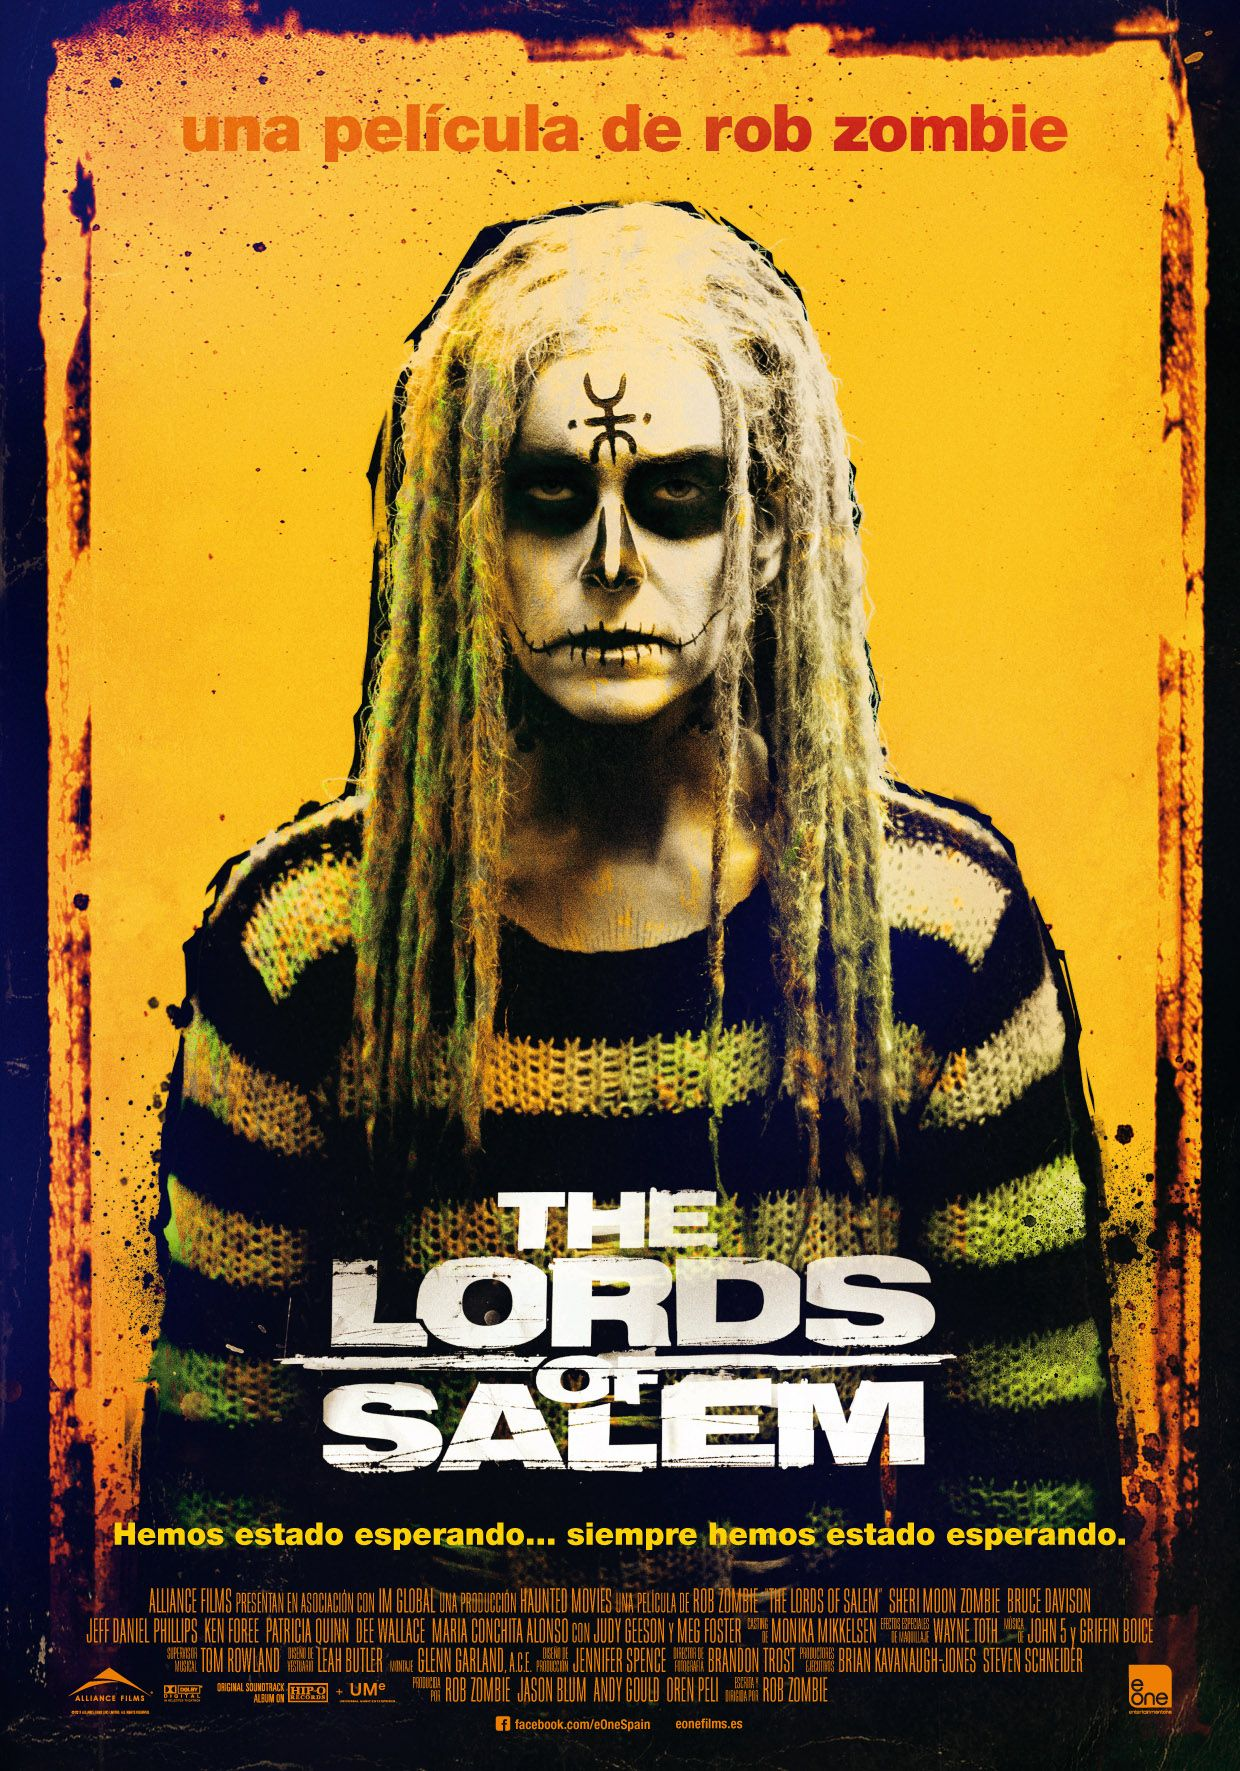 Lords of Salem, Dimension Films